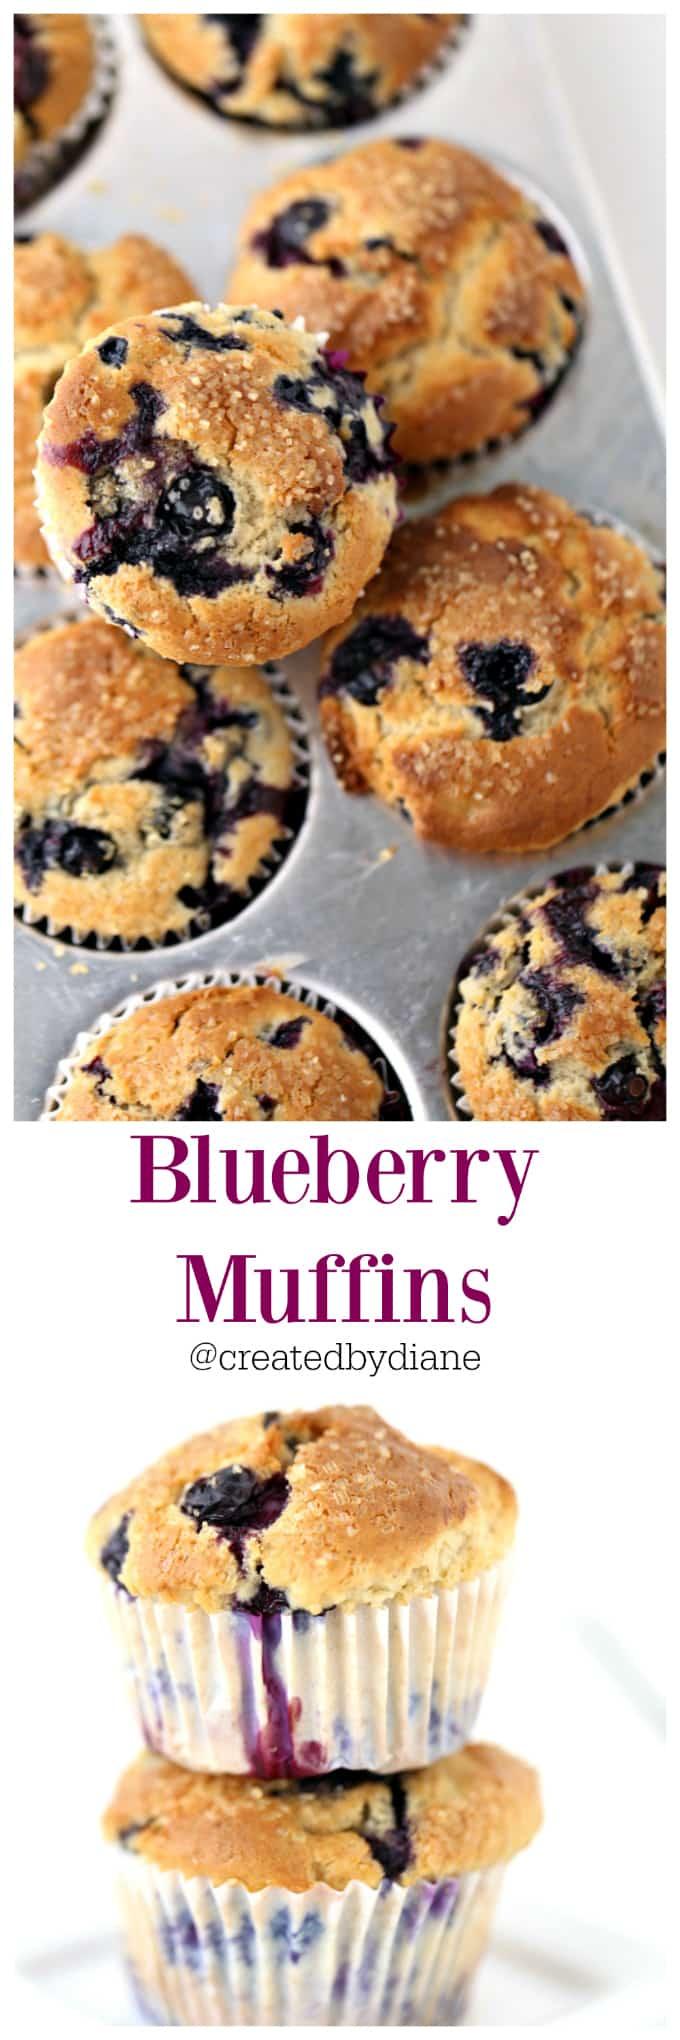 blueberry muffins @createdbydiane